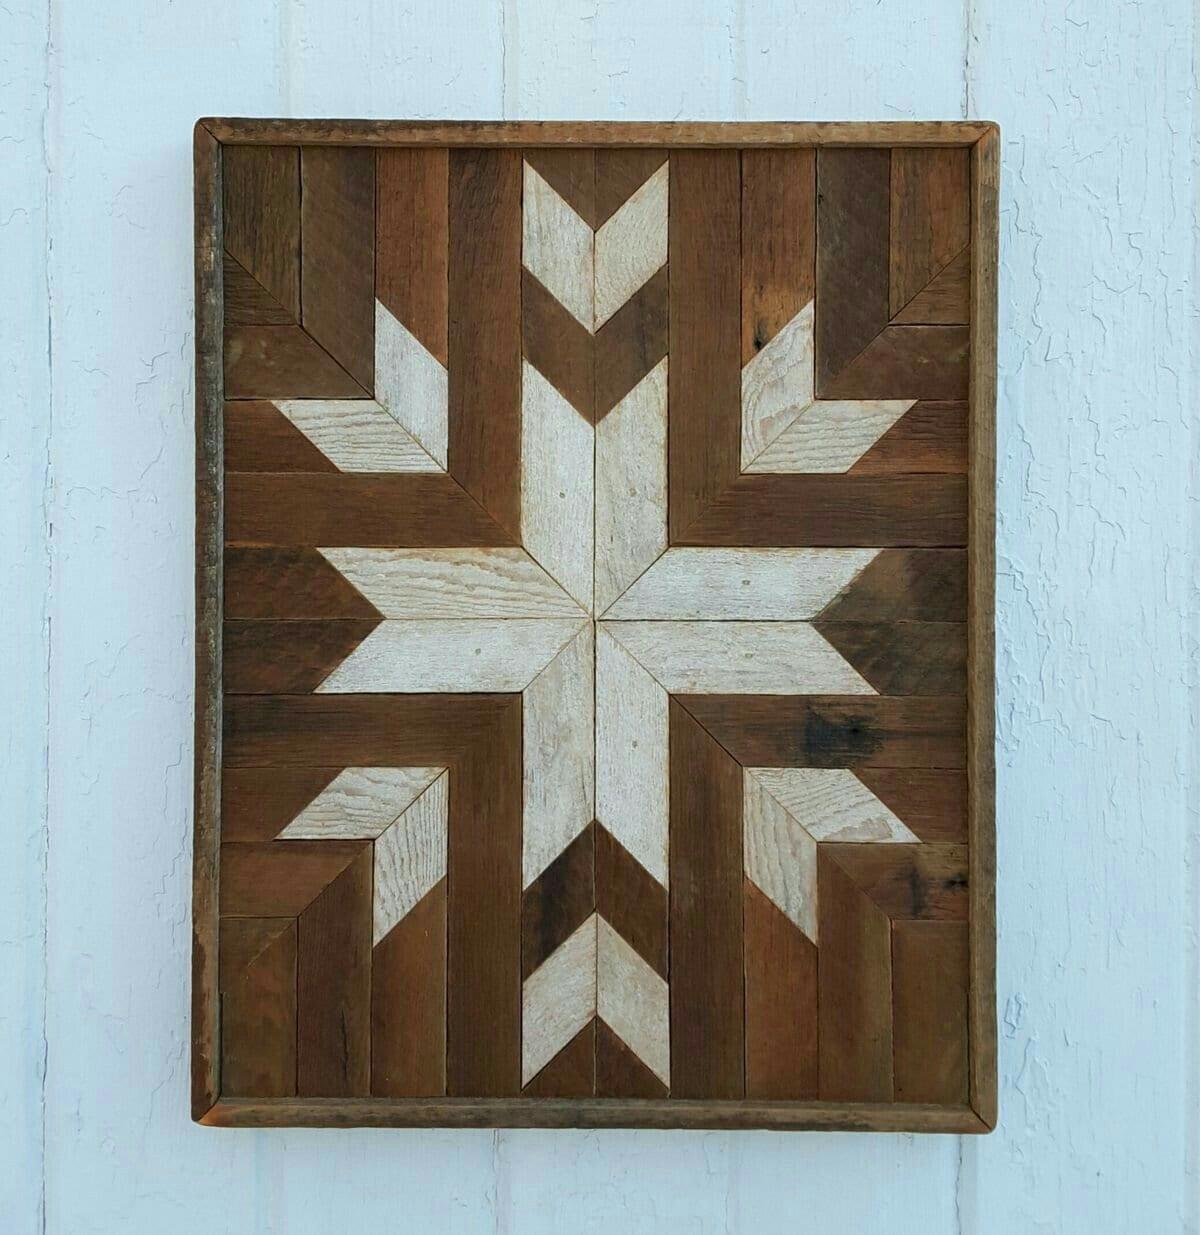 Reclaimed Home Decor: Reclaimed Wood Wall Art Decor Geometric Design Lath Art